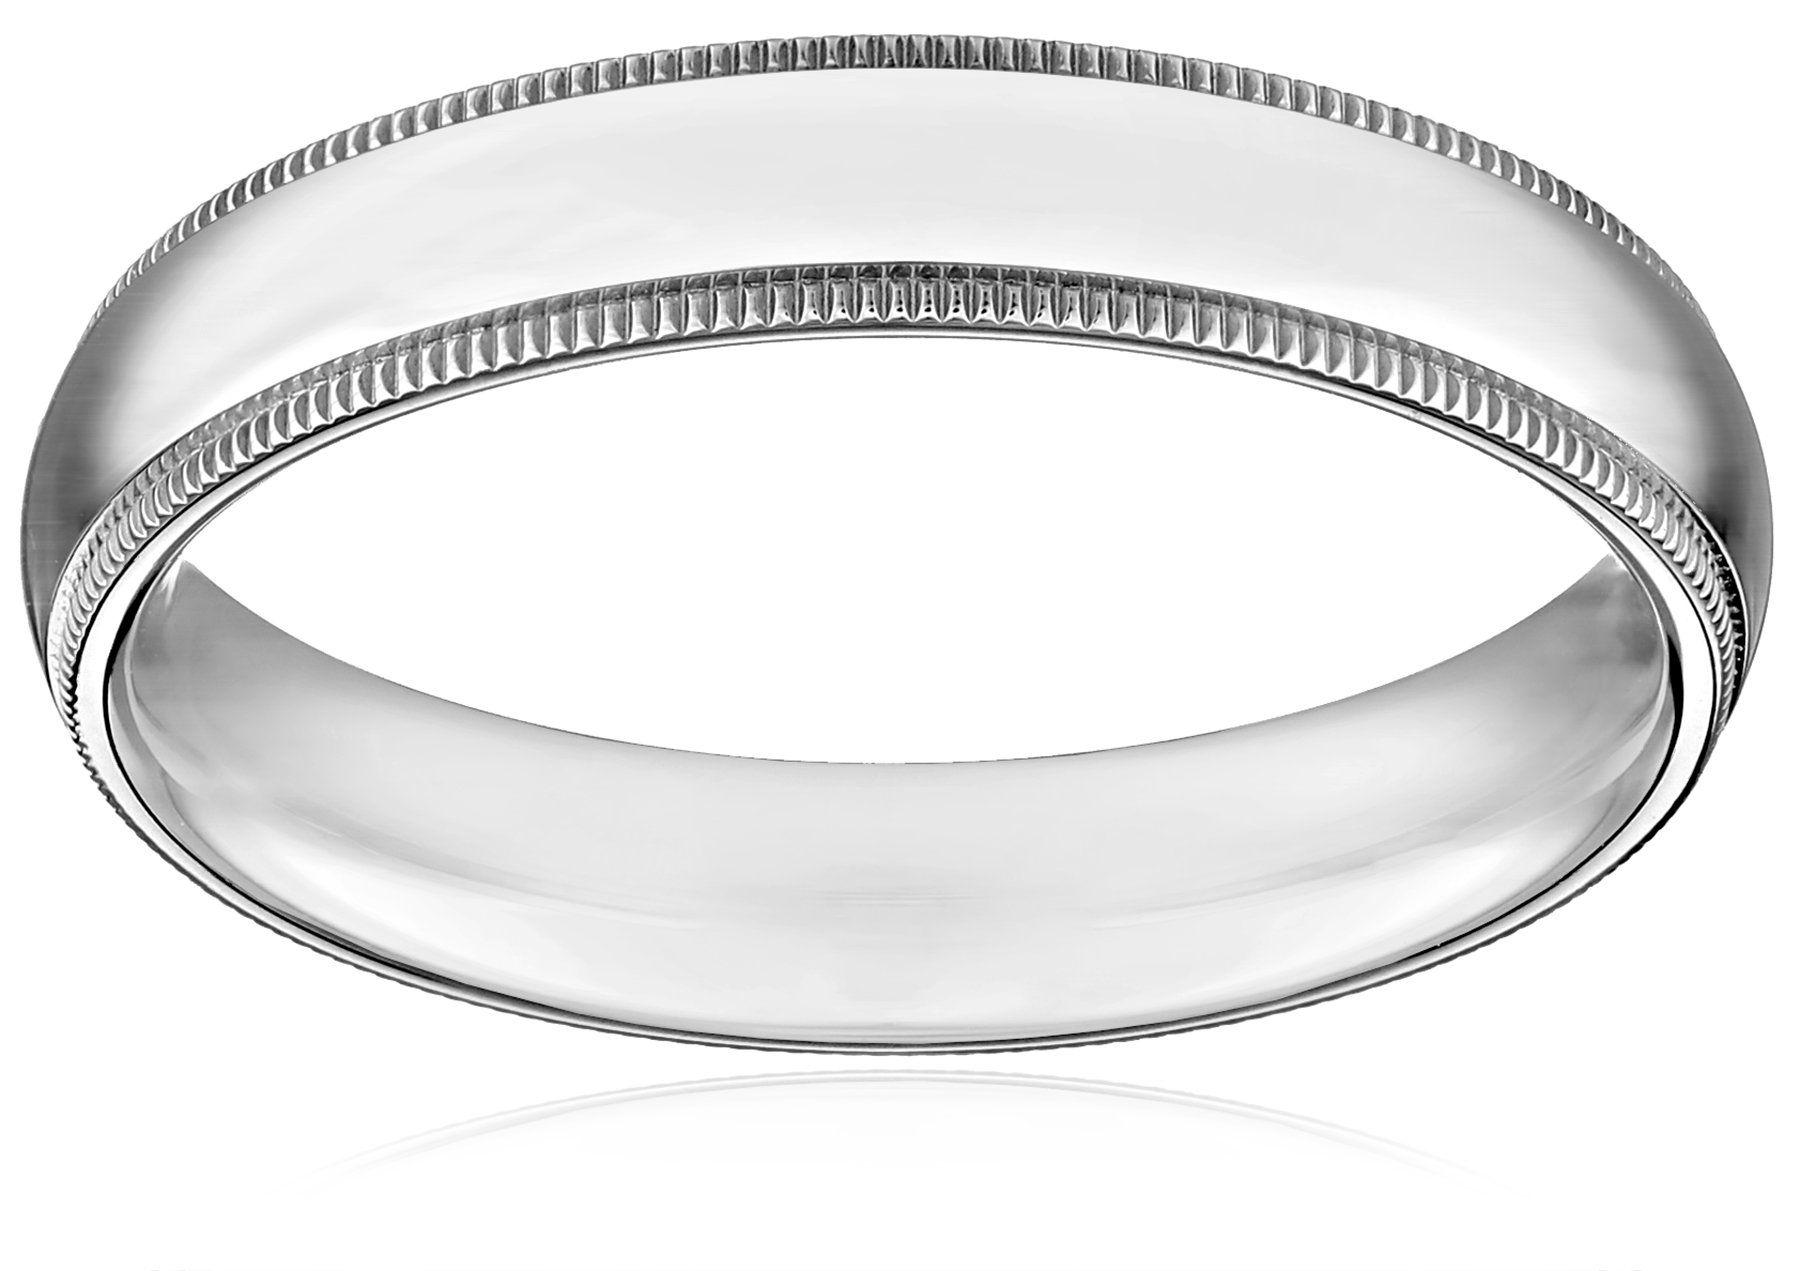 Standard Comfort-Fit 14K White Gold Milgrain Band, 4mm, Size 8.5. Domestic.